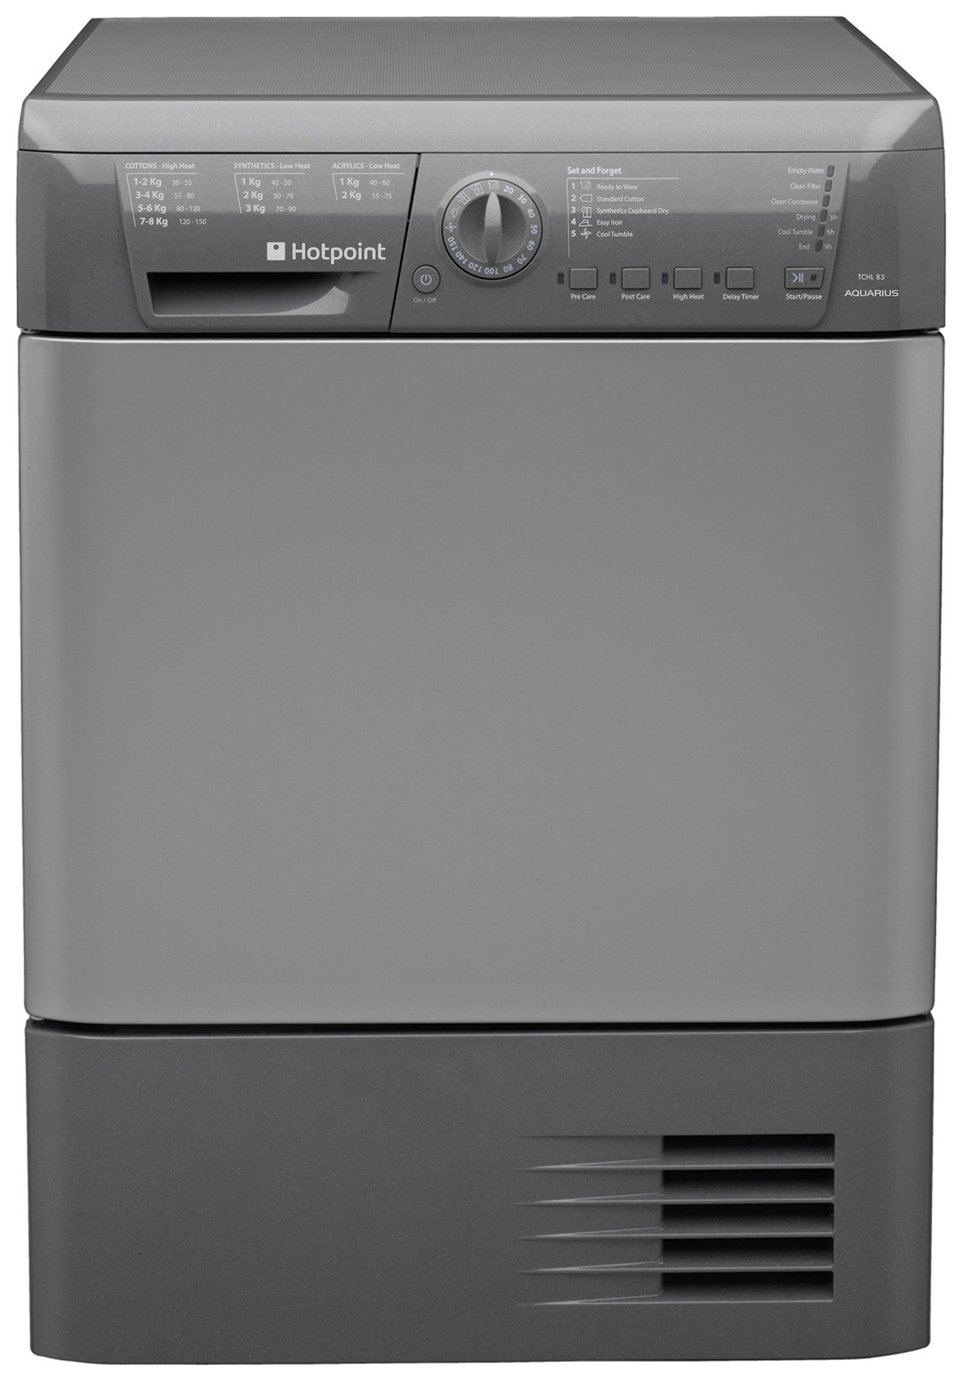 Hotpoint TCHL 83B RG Condenser Tumble Dryer - Graphite.